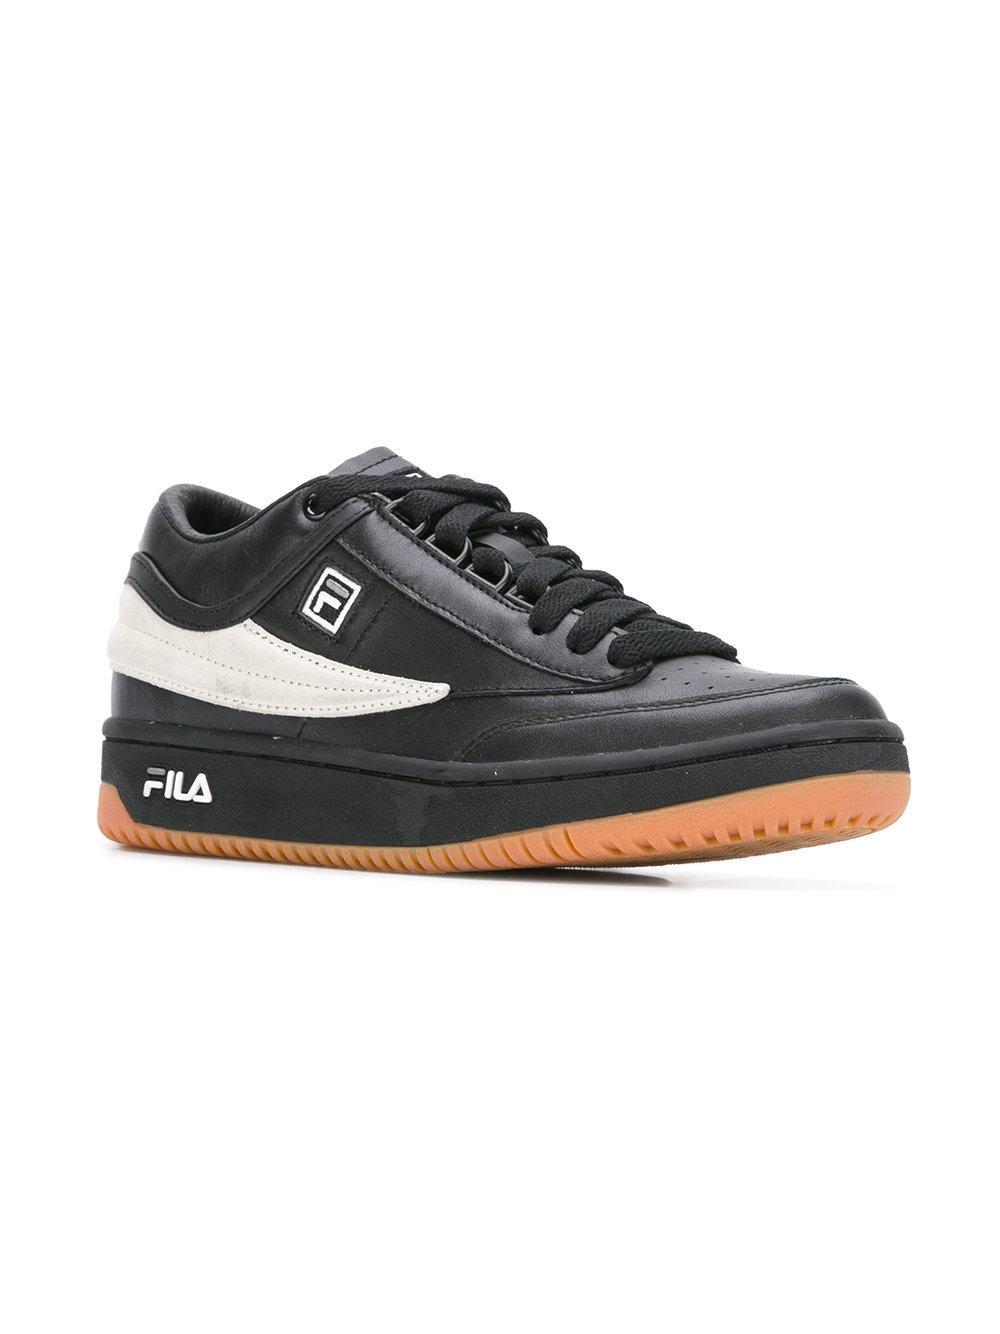 Fila Gosha Rubchinskiy X Sneakers in Black | Lyst